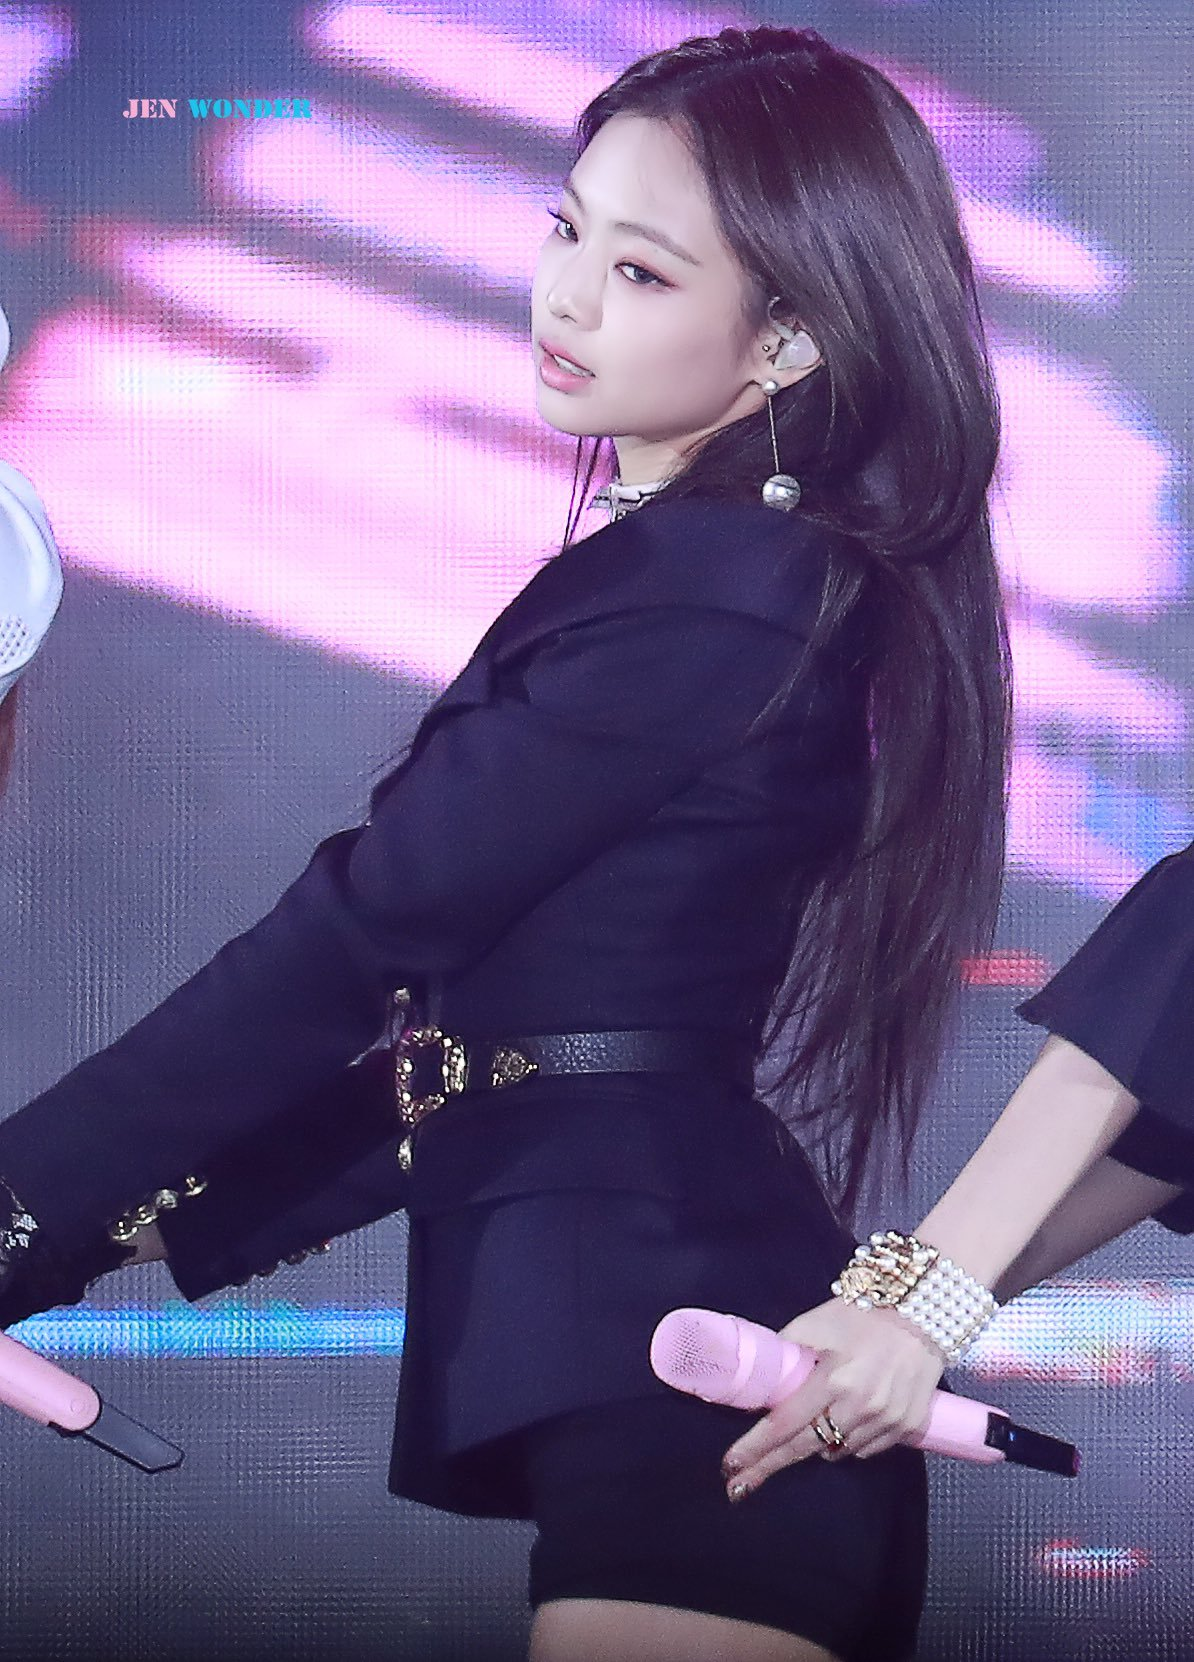 fe3f2d718111e TOP 10 Sexiest Outfits Of BLACKPINK Jennie (30+ Photos) - Koreaboo